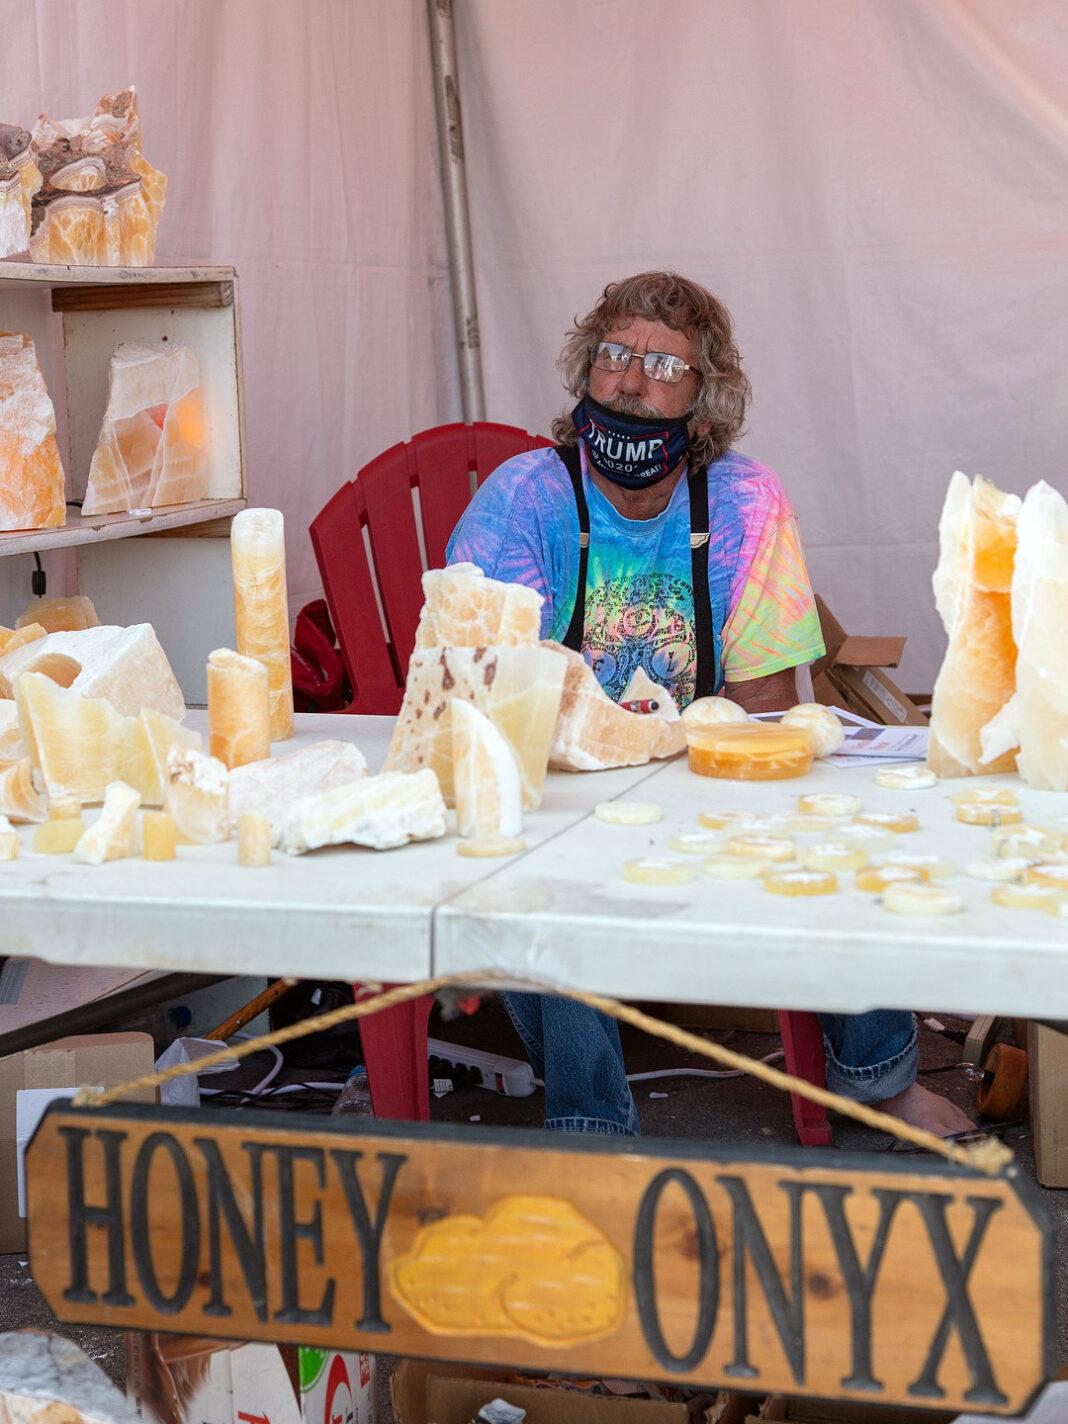 Jim Maxwell at his Honey Onyx vendor booth